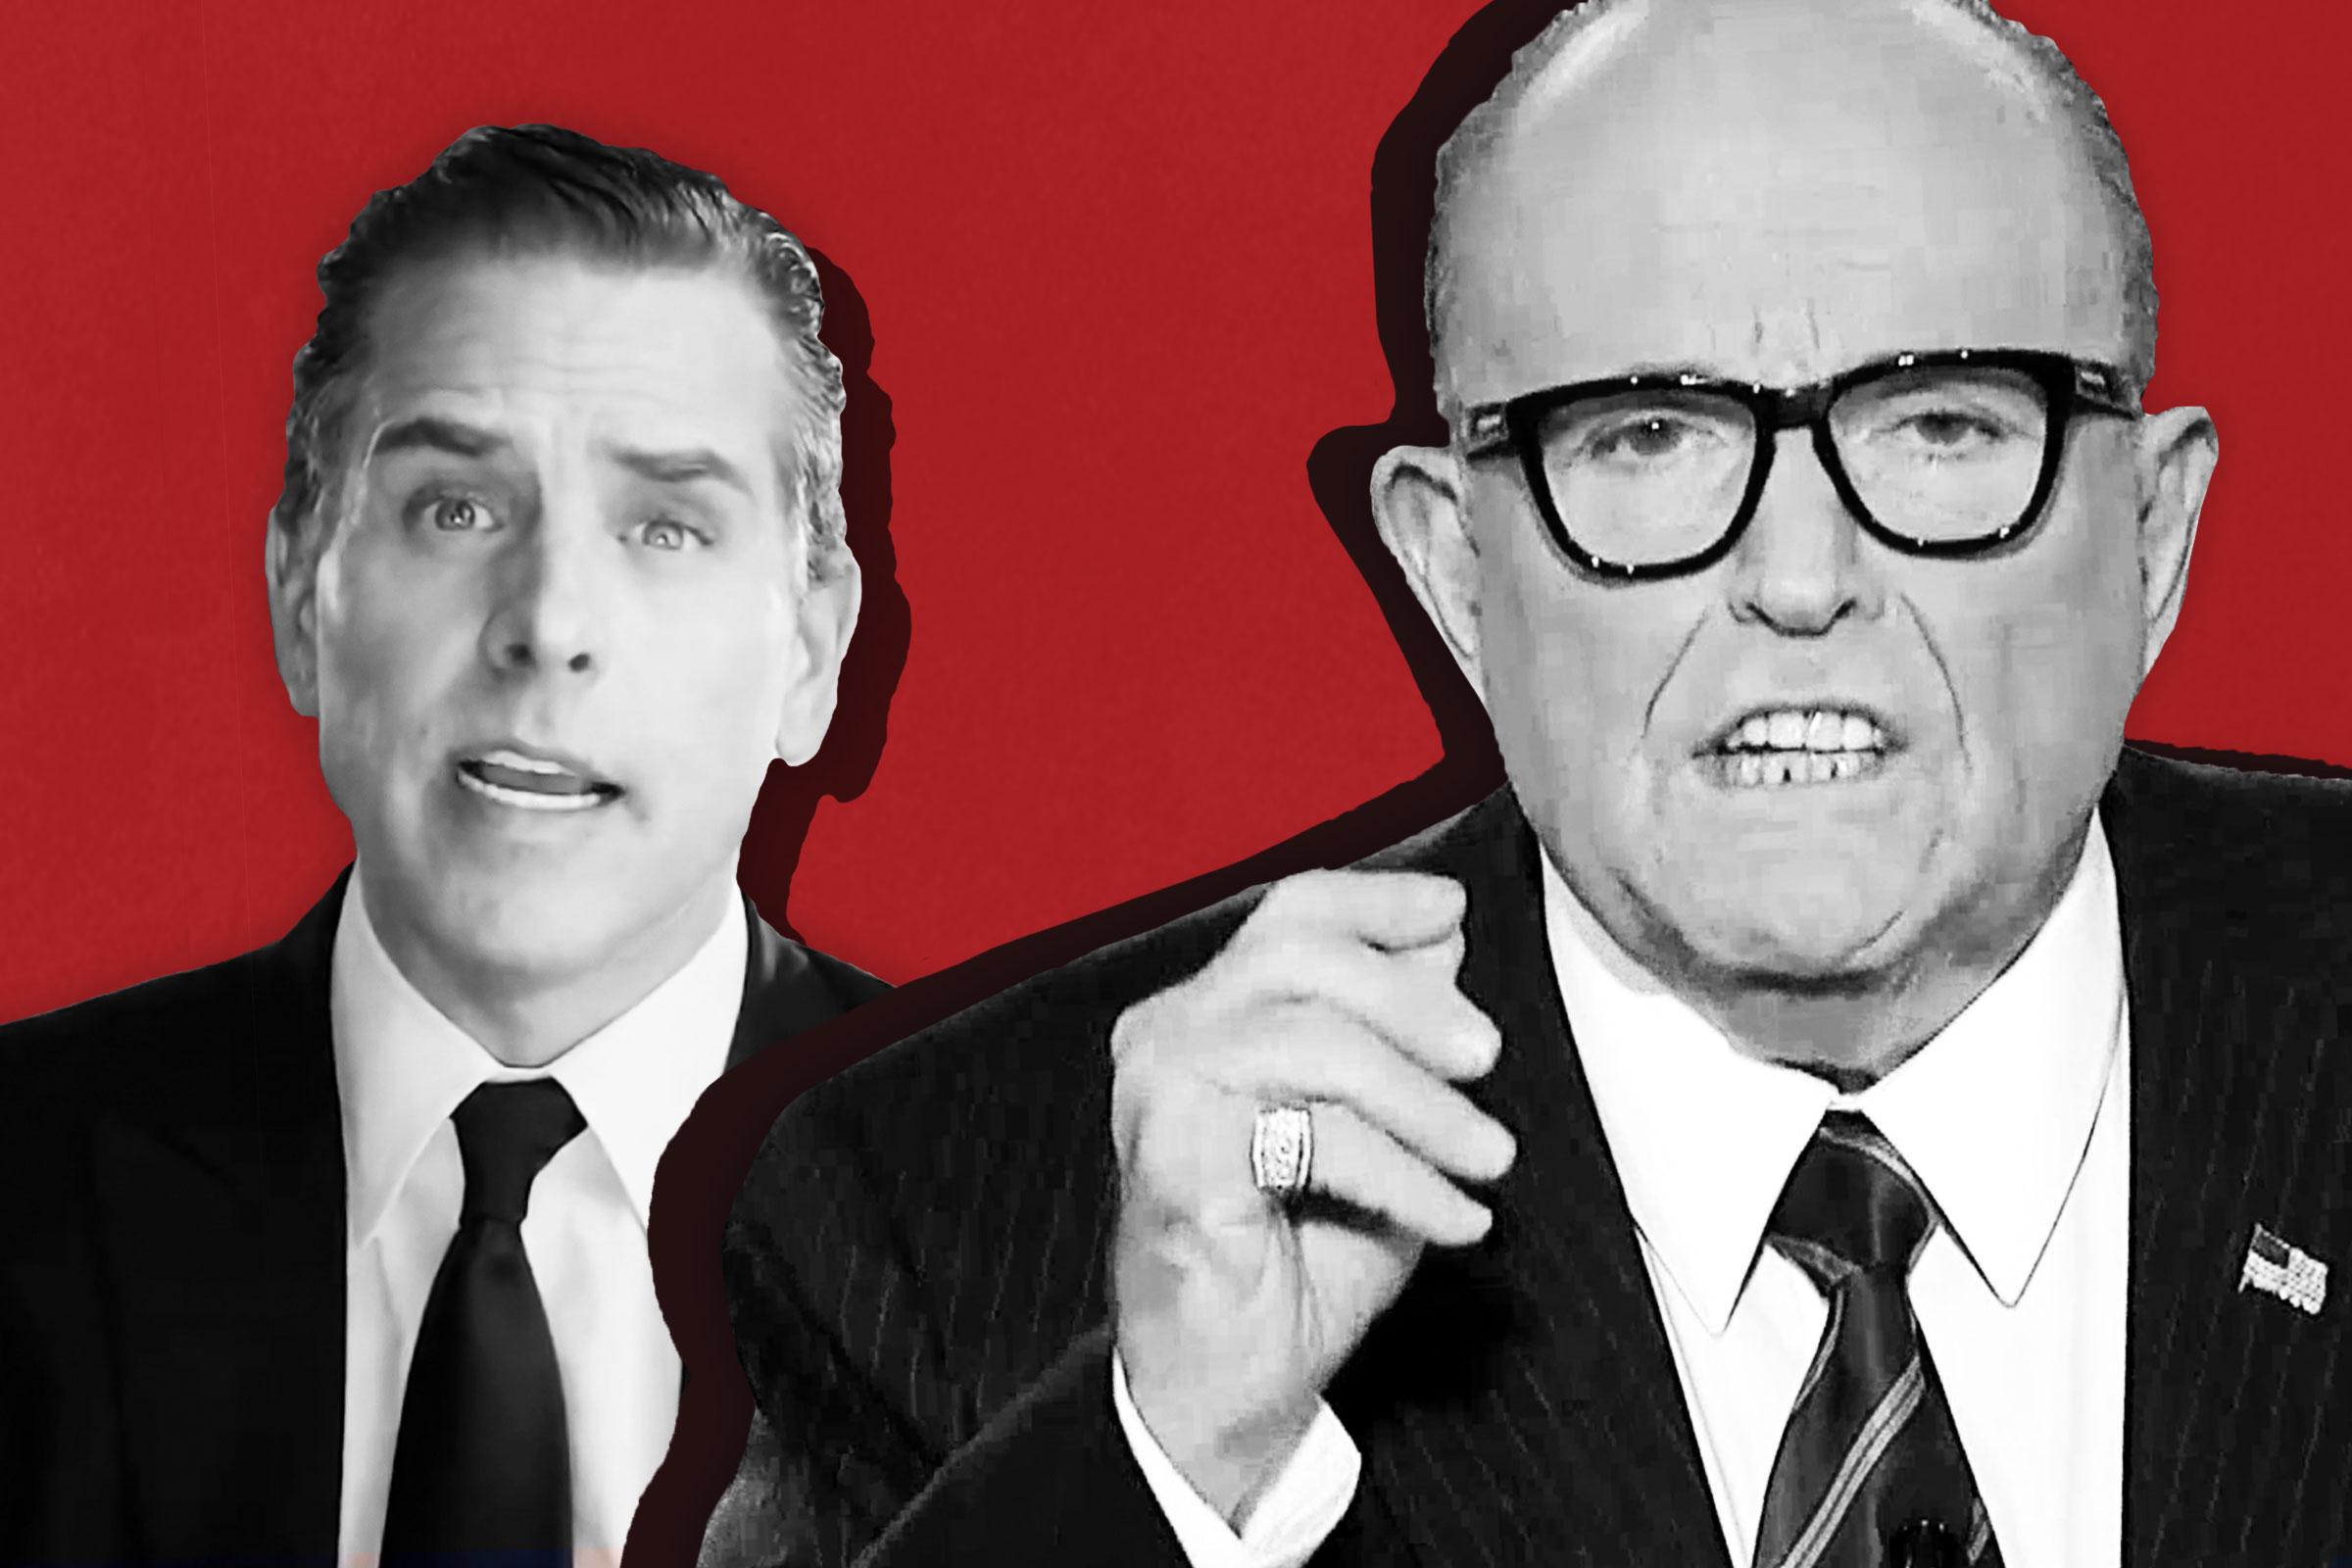 Hunter Biden, son of Democratic presidential nominee Joe Biden; Personal attorney to President Donald Trump and former New York City Mayor Rudy Giuliani